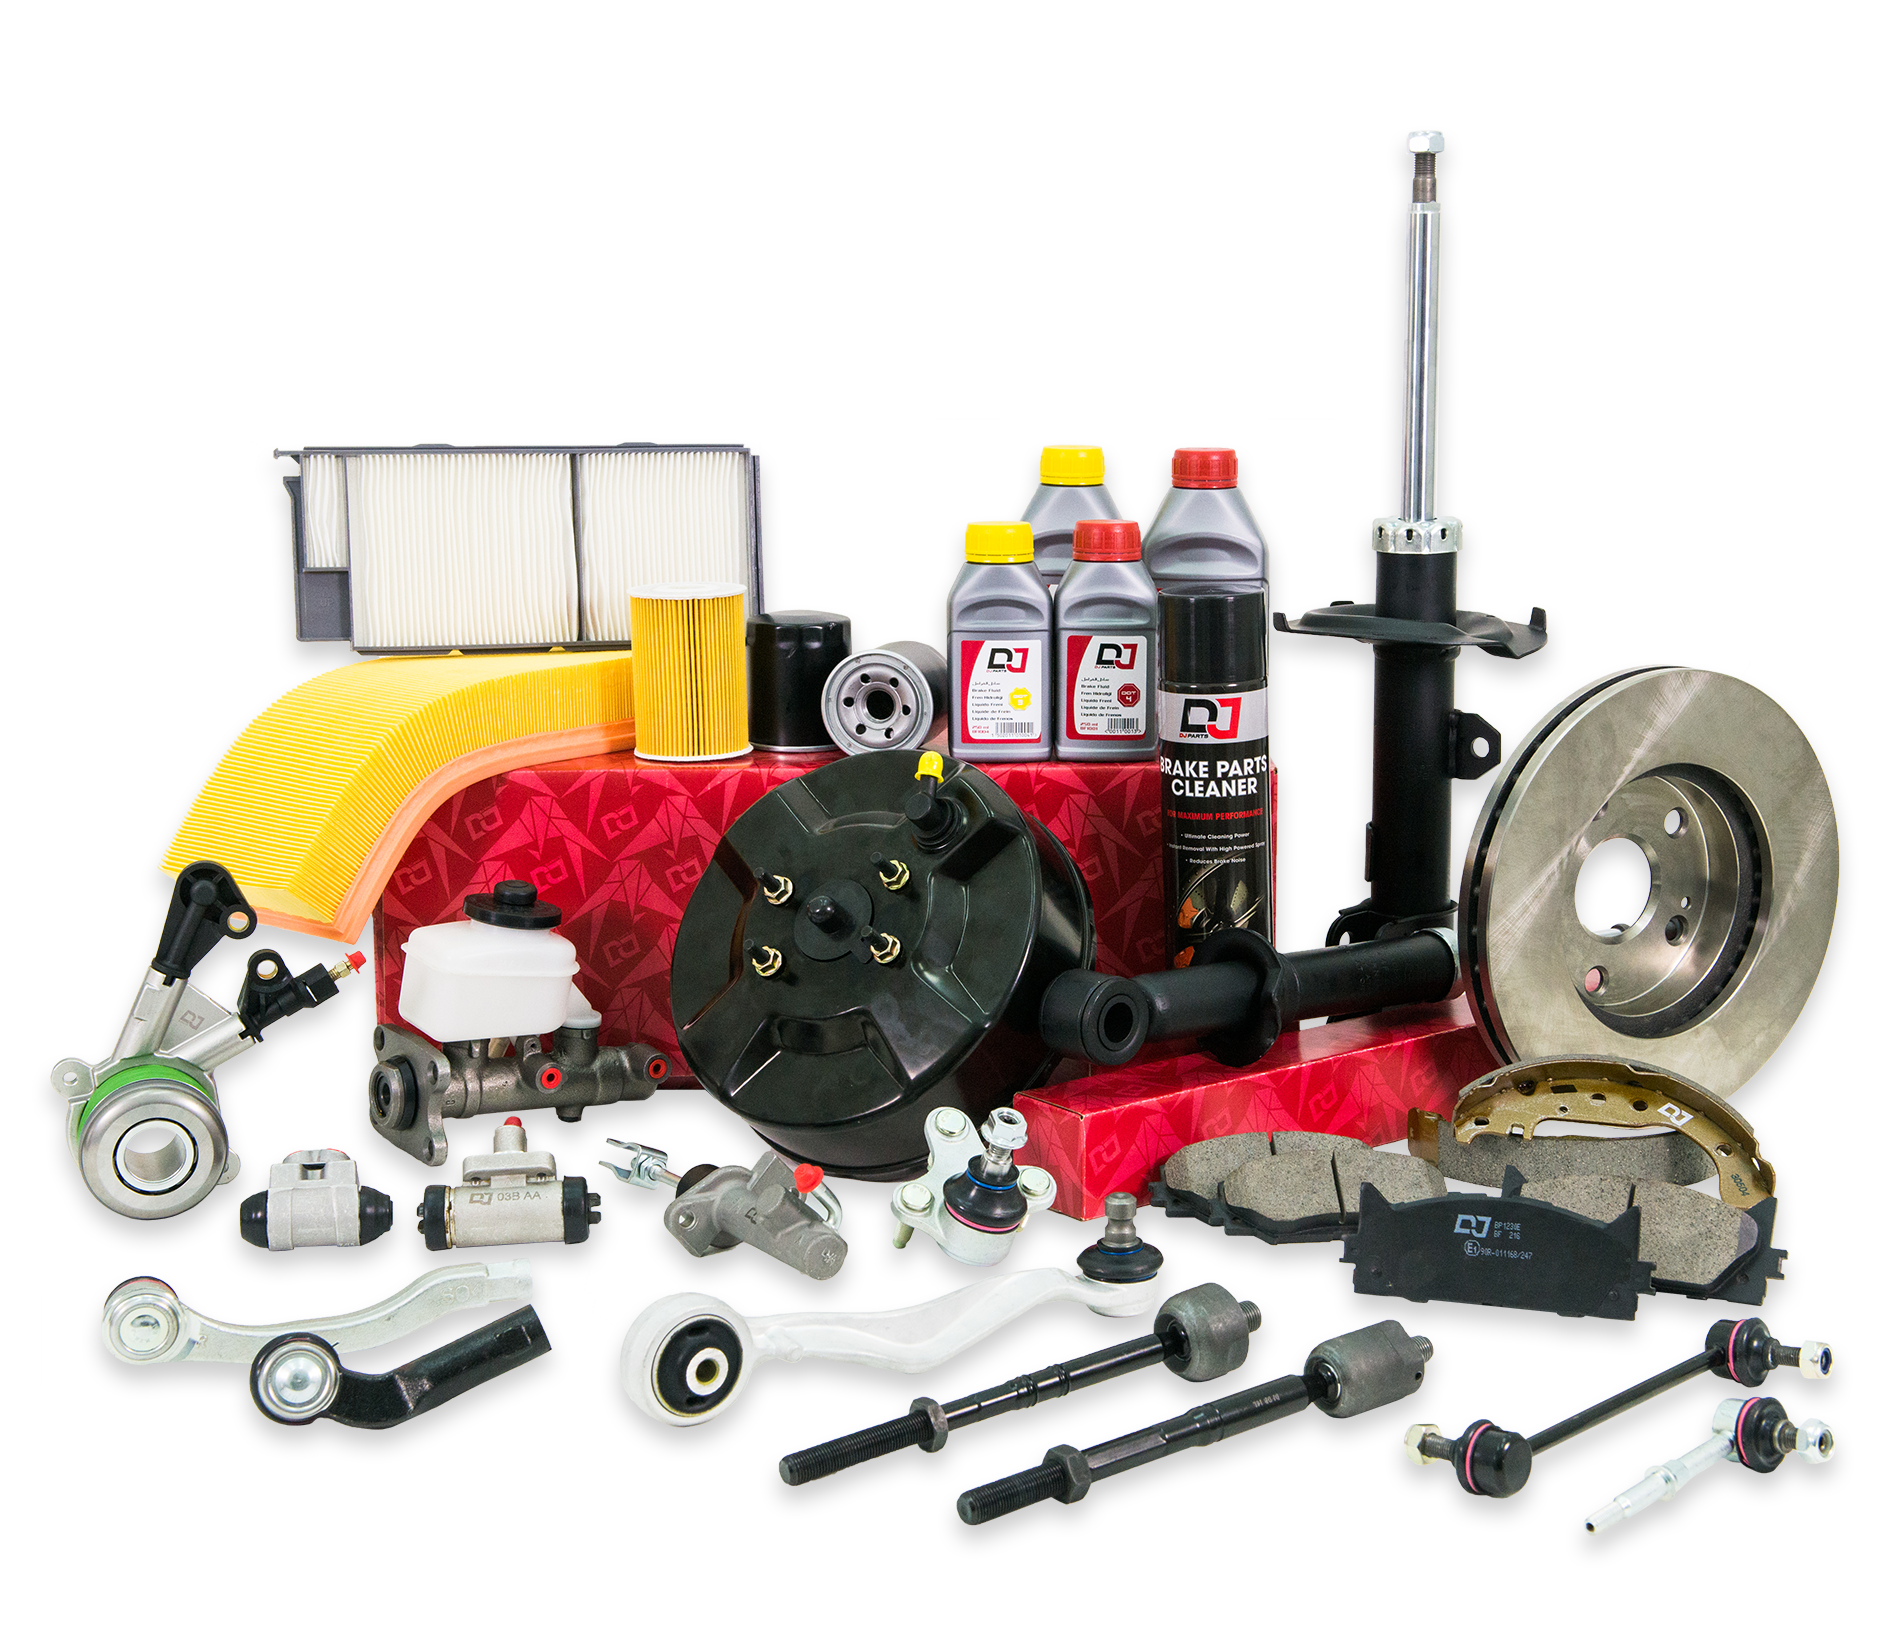 dj parts product grp png